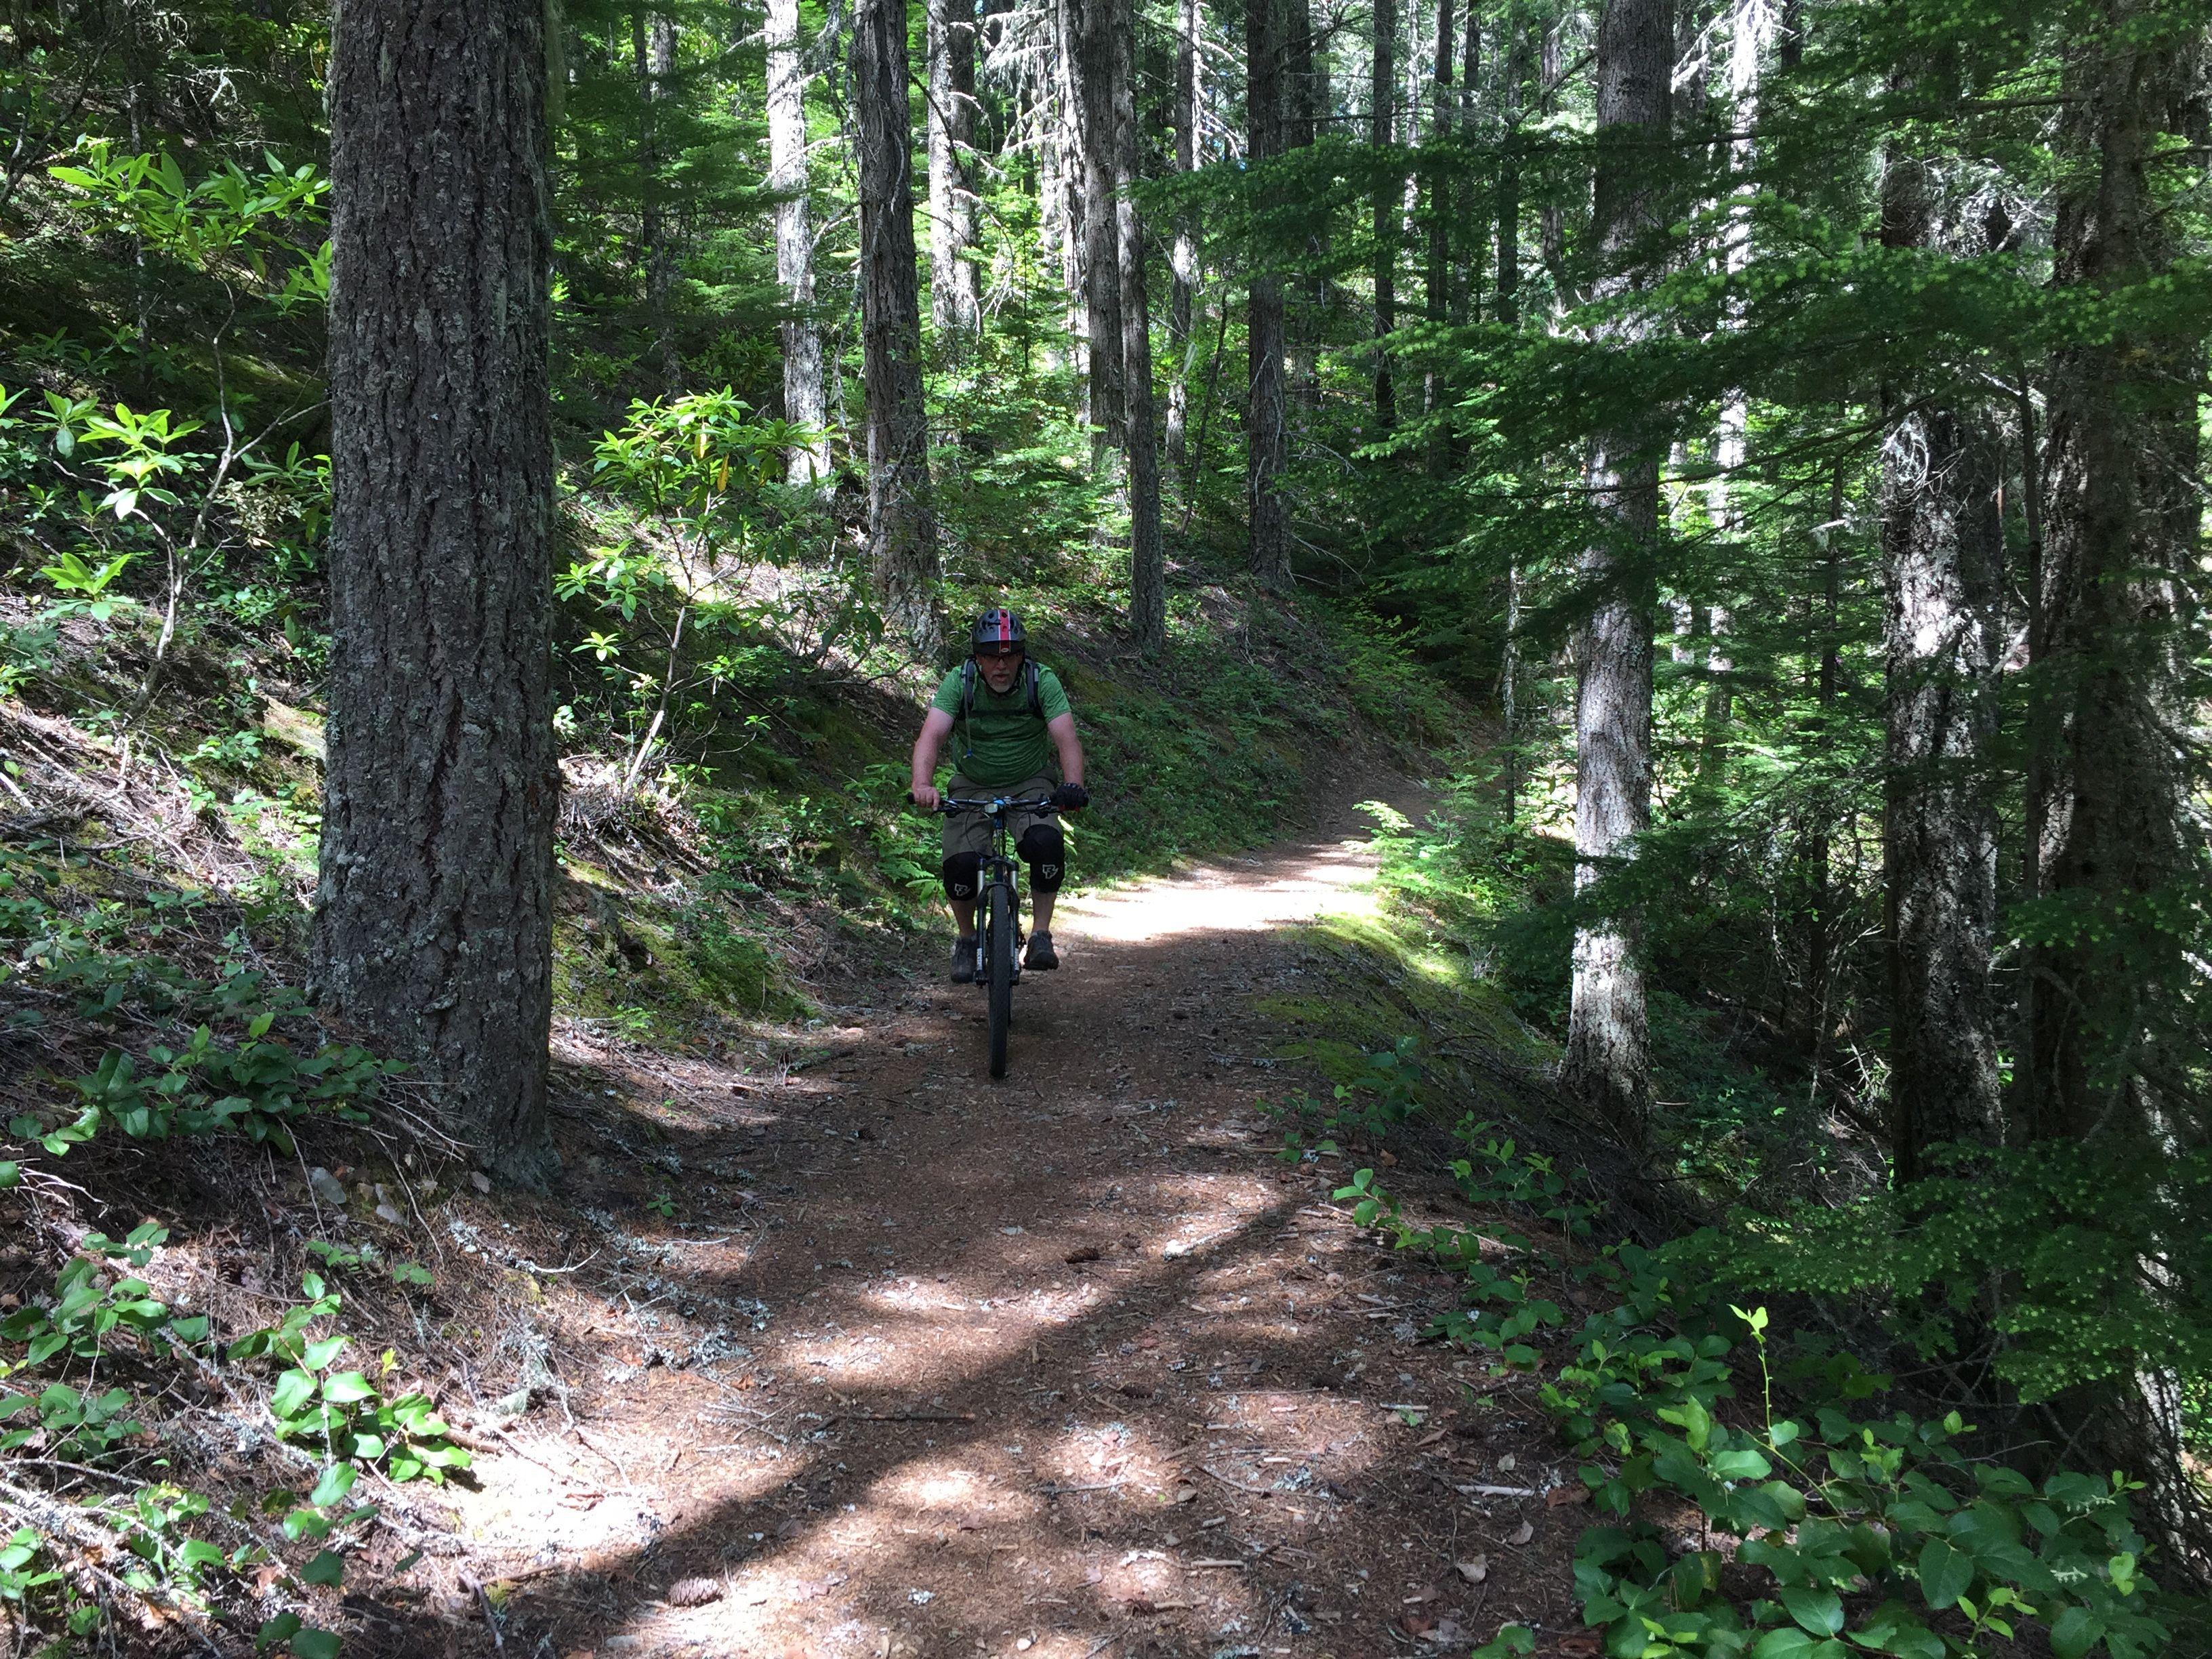 Portland Area Recreational Cyclists (PARC)